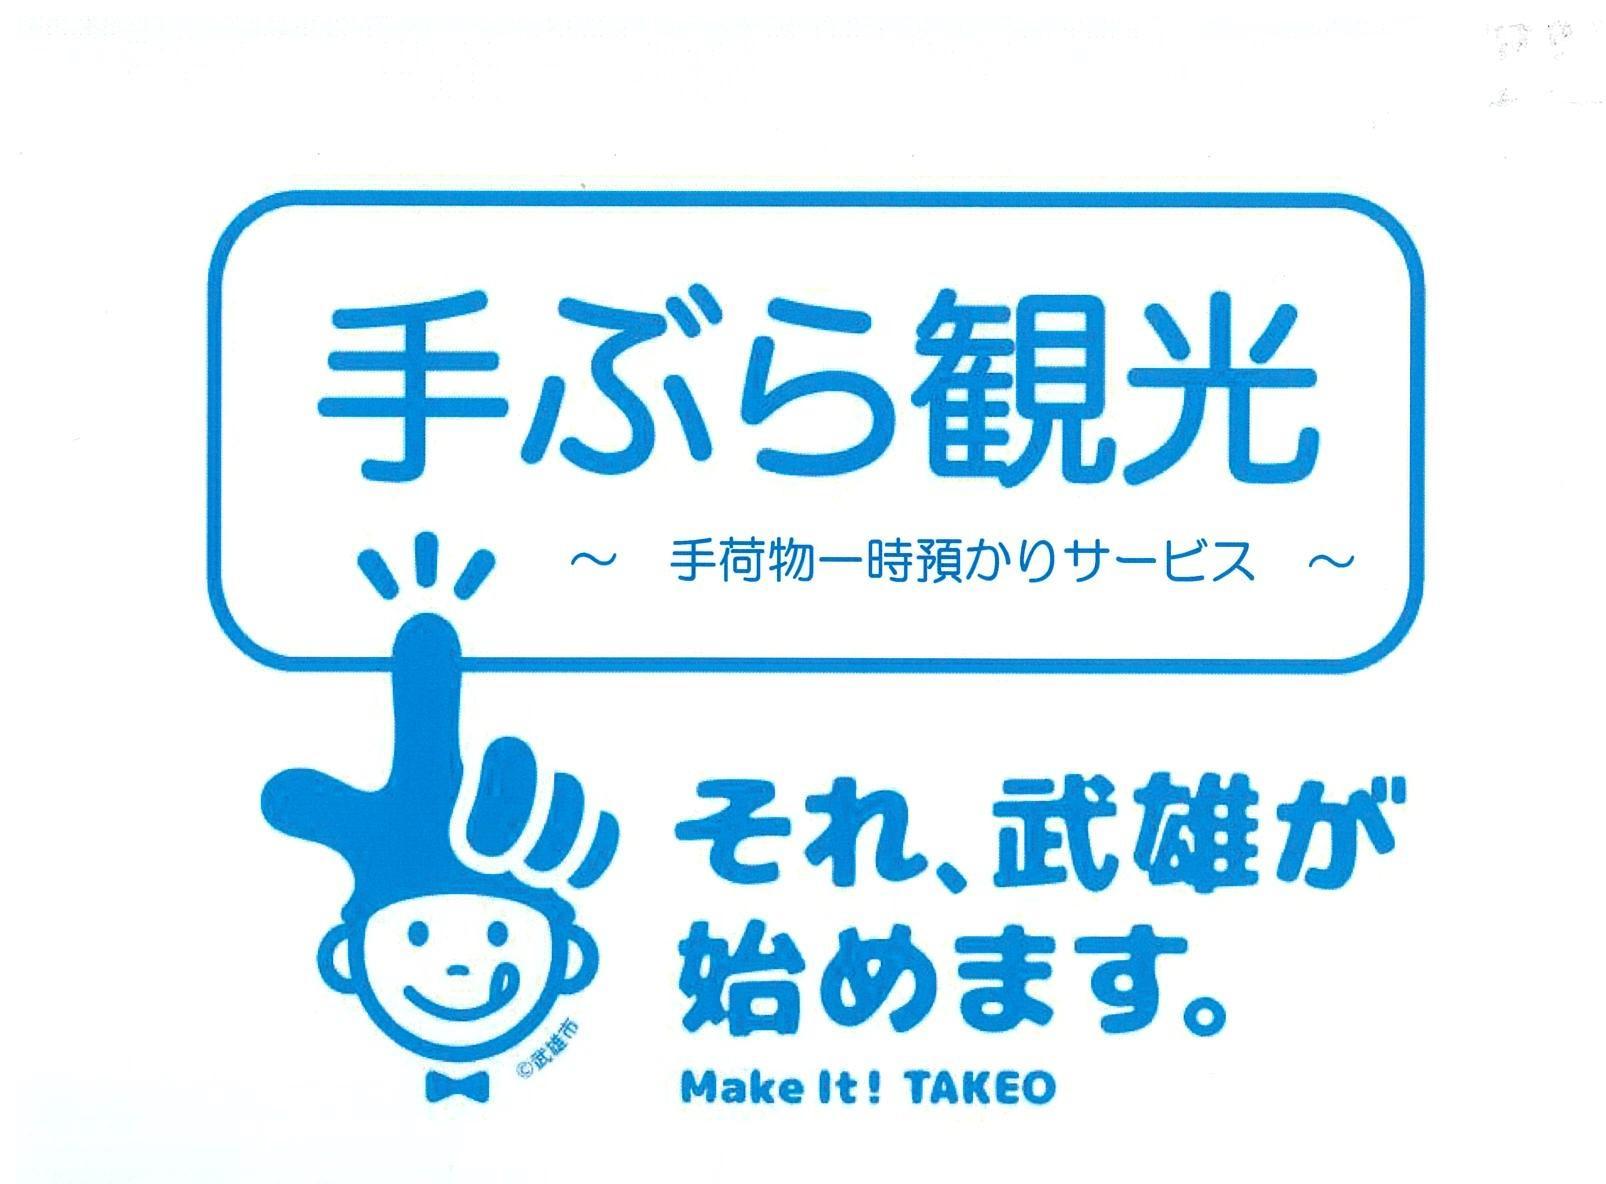 http://www.takeo-kk.net/news/uploads/20190725101155-0001.jpg